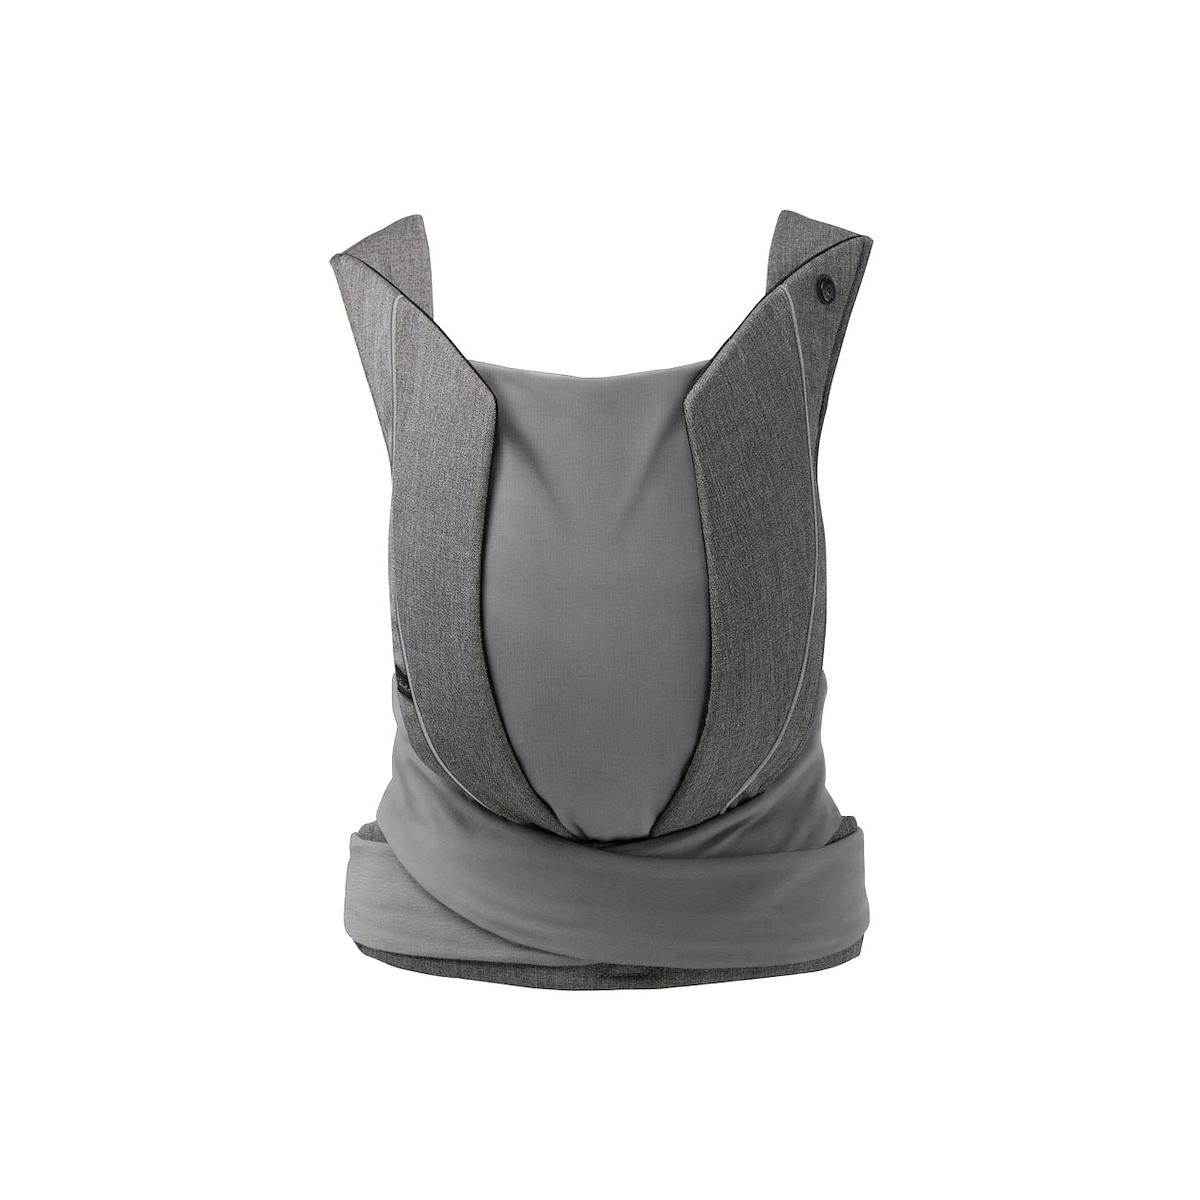 Portabebé YEMA TIE Cybex denim Manhattan grey-mid grey